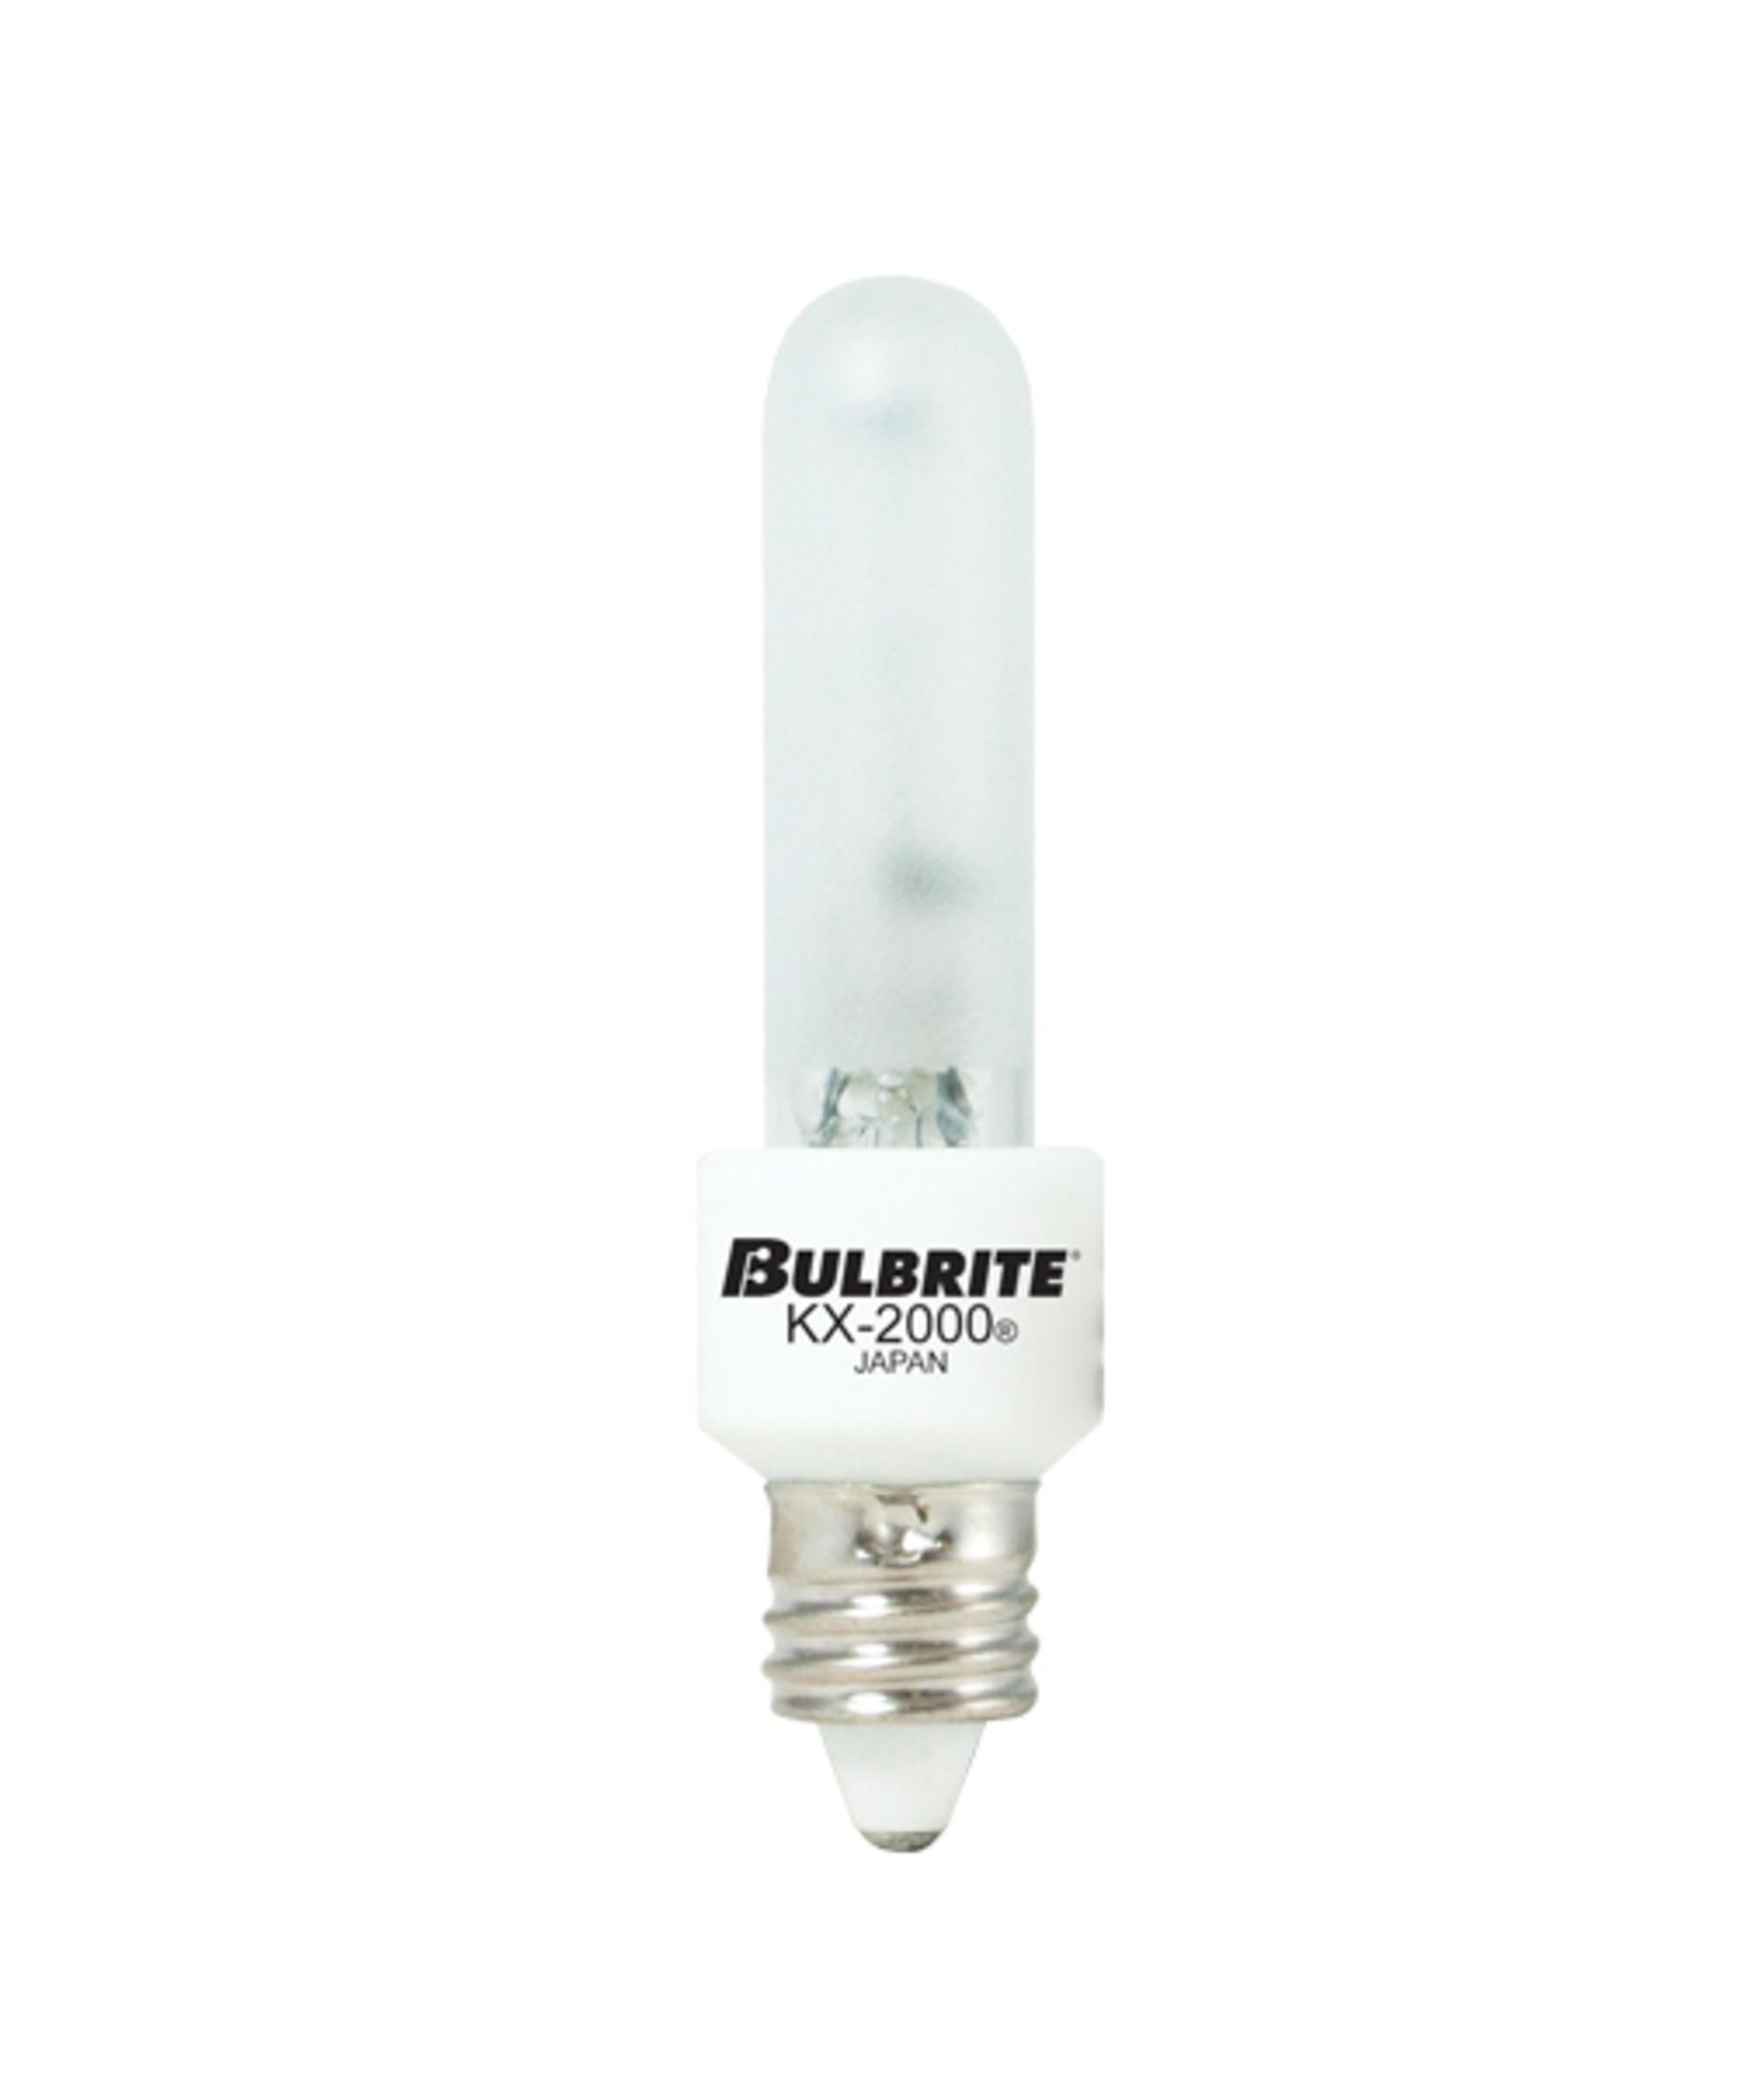 Bulbrite 473141 KX40FR/MC 40 Watt T3 KX2000, Frost, Mini Candelabra base, 120 volts (Pack of 6)